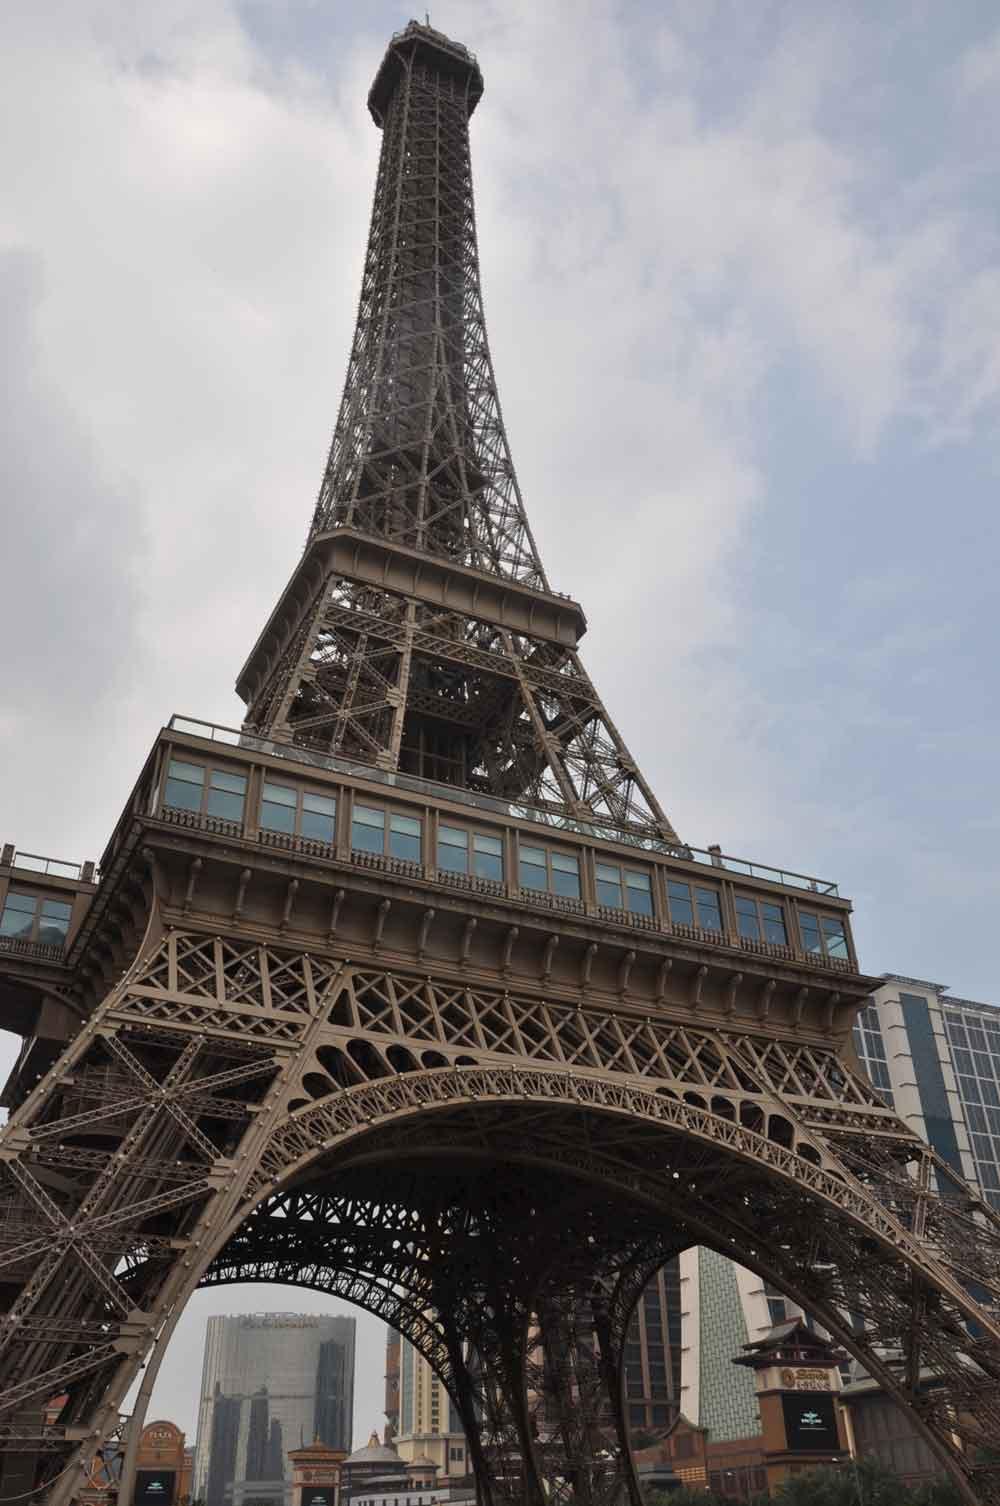 Eiffel Tower at Parisian Macao